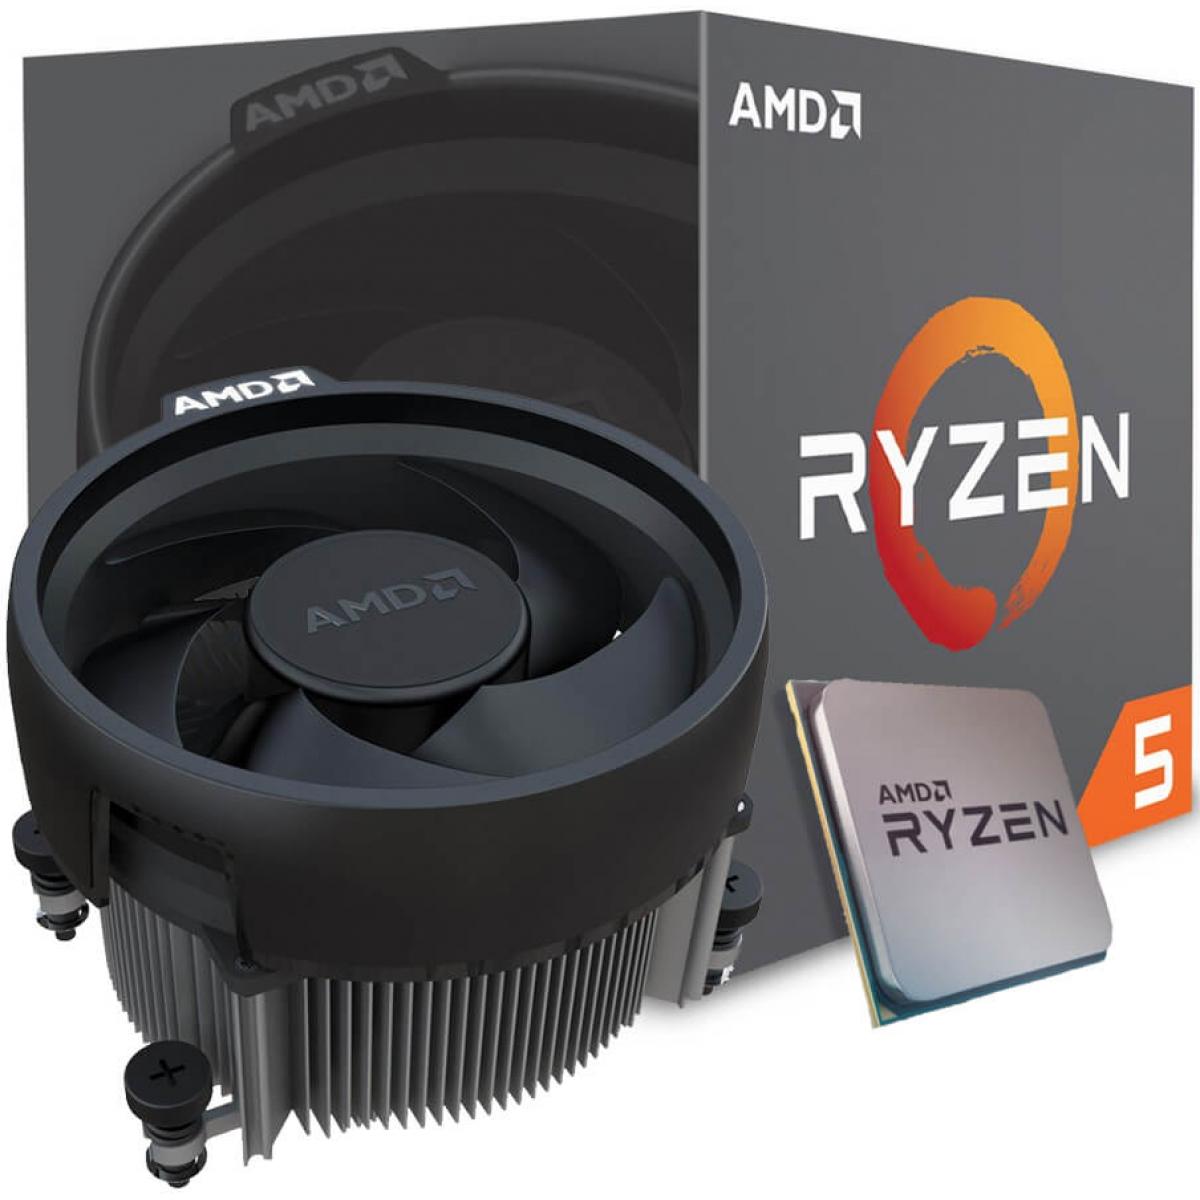 Processador AMD Ryzen 5 2600X 3.6GHz (4.25GHz Turbo), 6-Cores 12-Threads, Cooler Wraith Spire, AM4, YD260XBCAFBOX, S/ Video